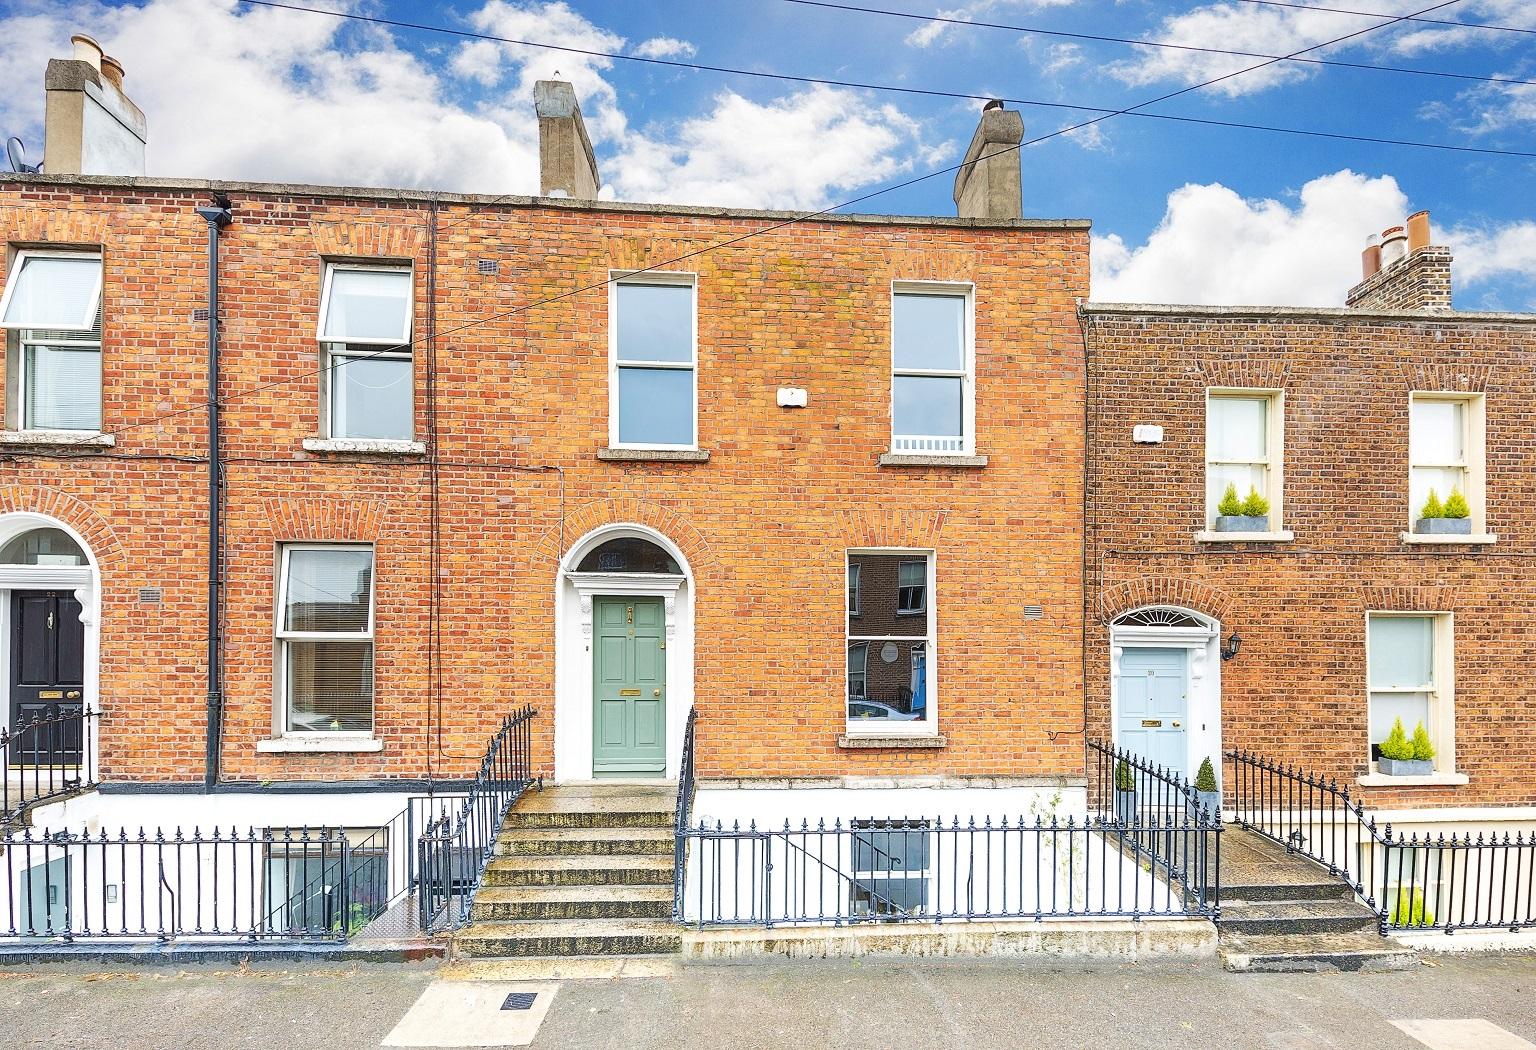 21 Synge Street, Portobello, Dublin 8